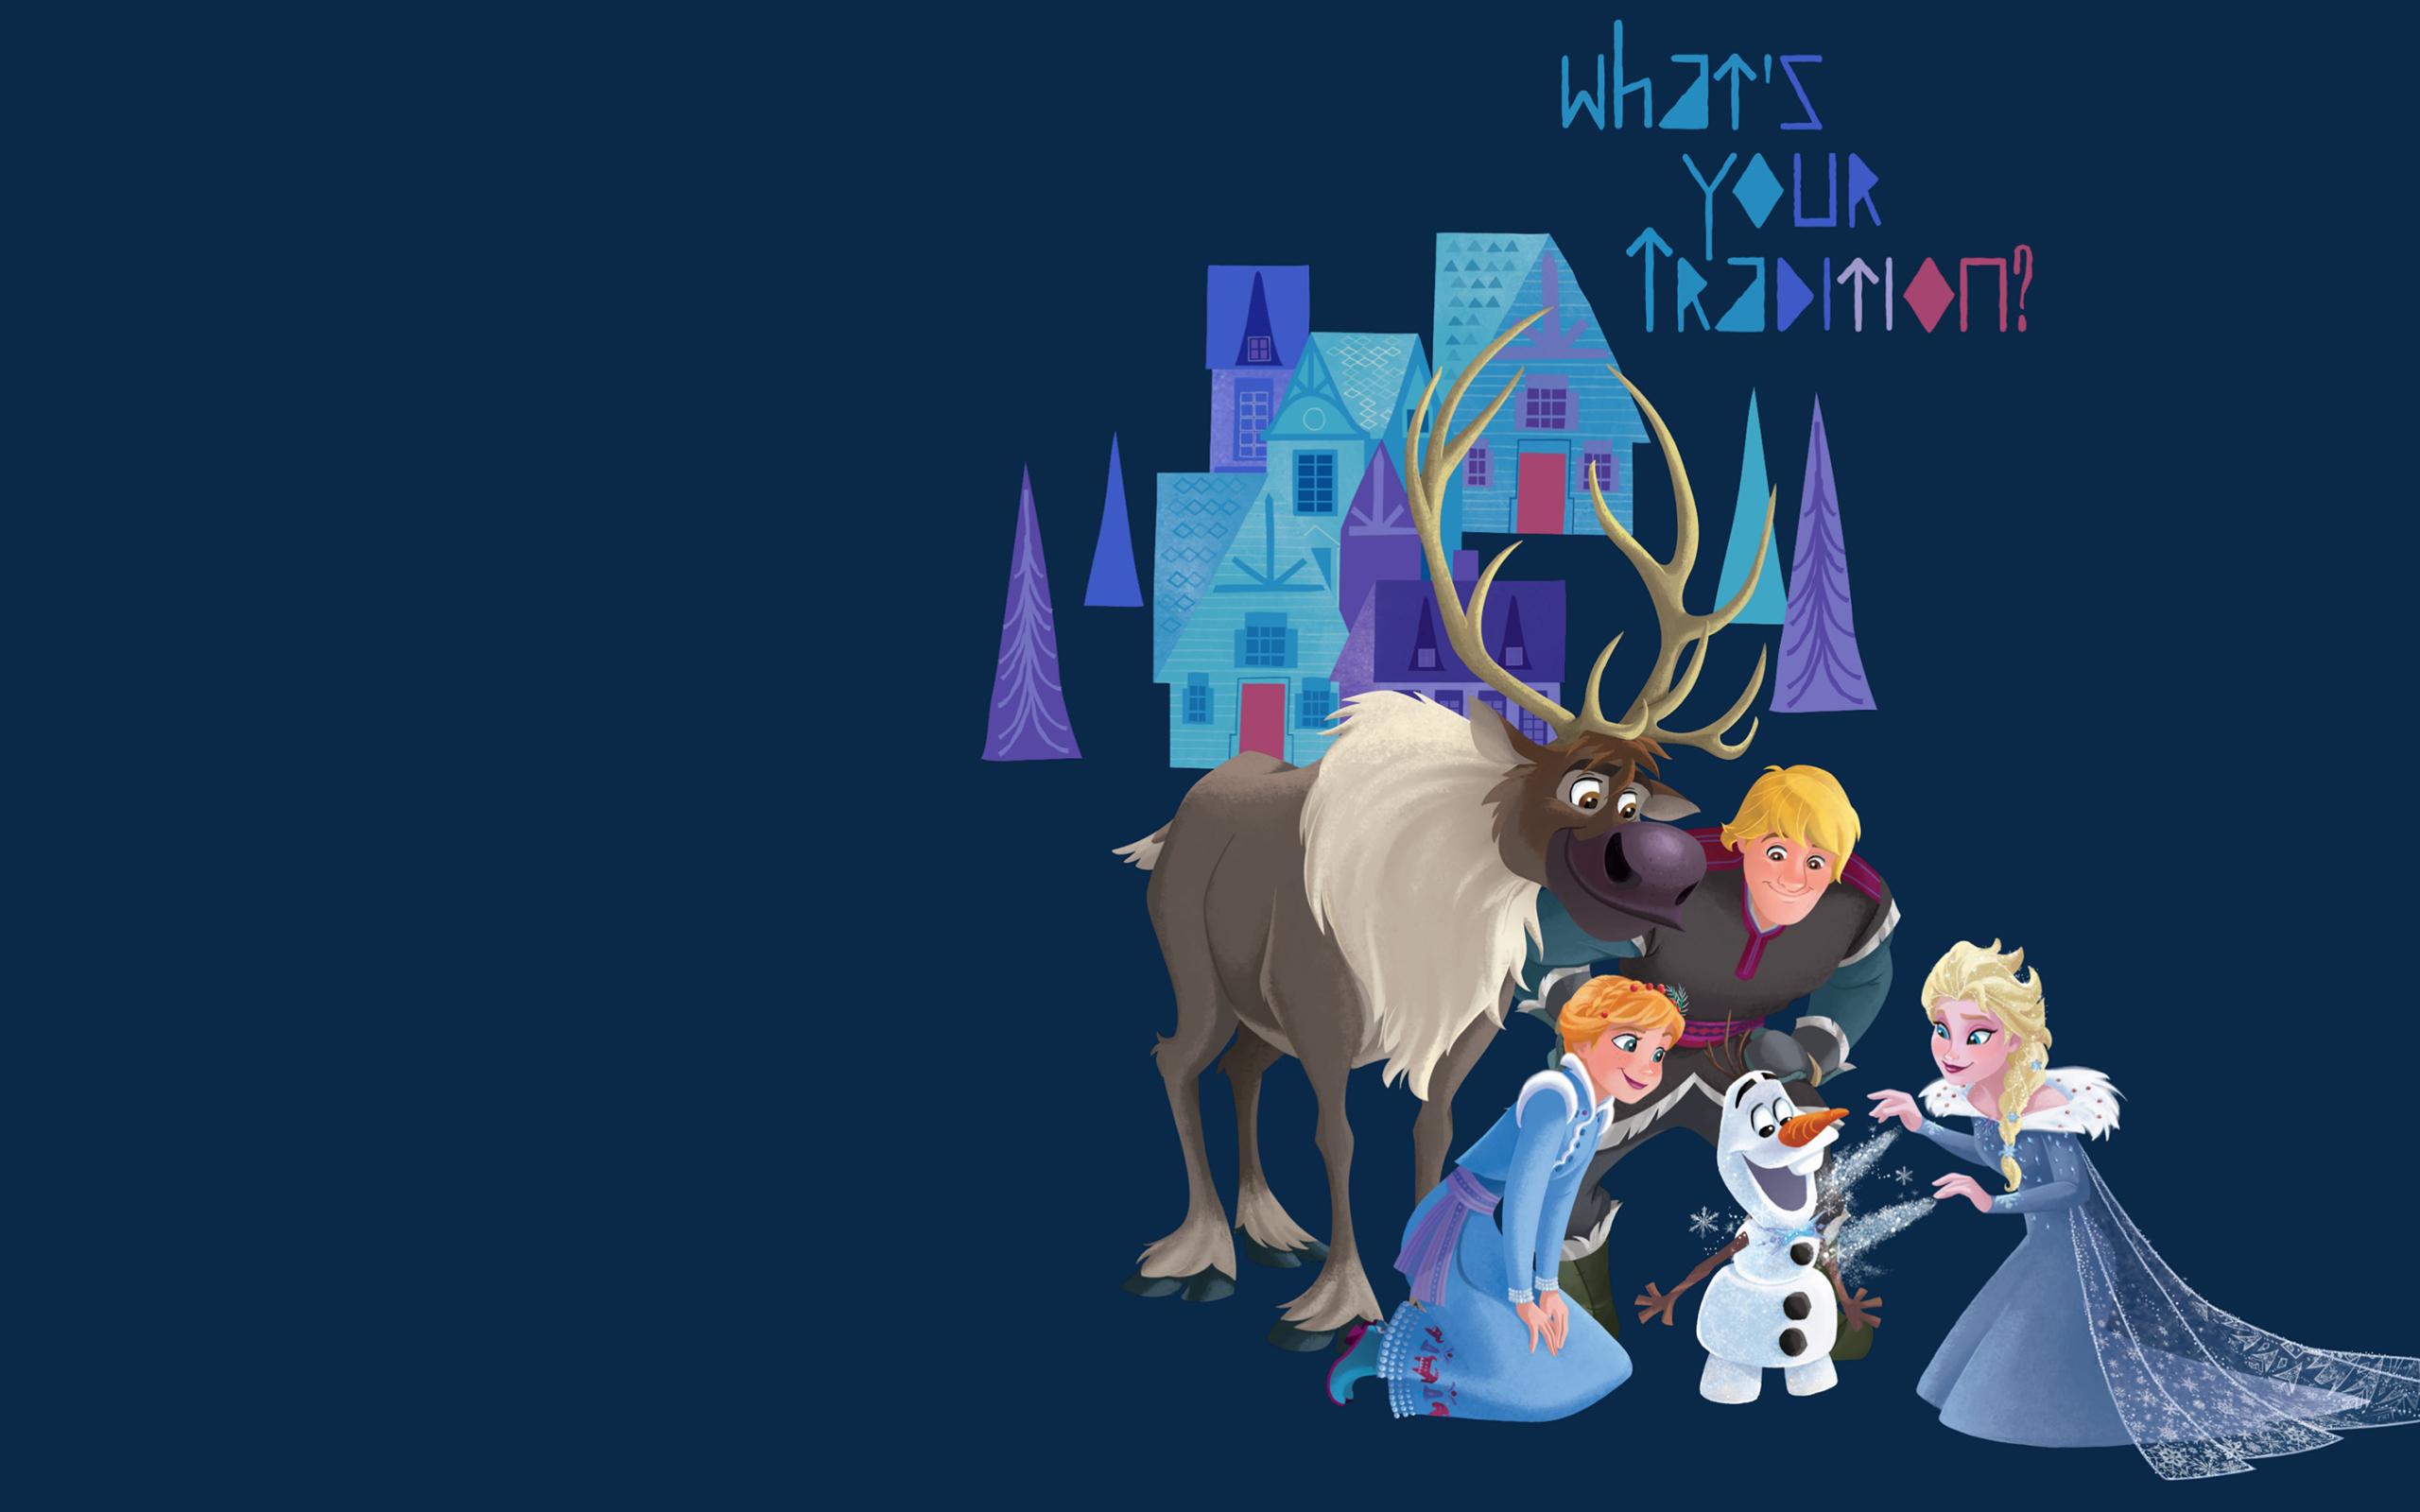 OlafS Frozen Adventure